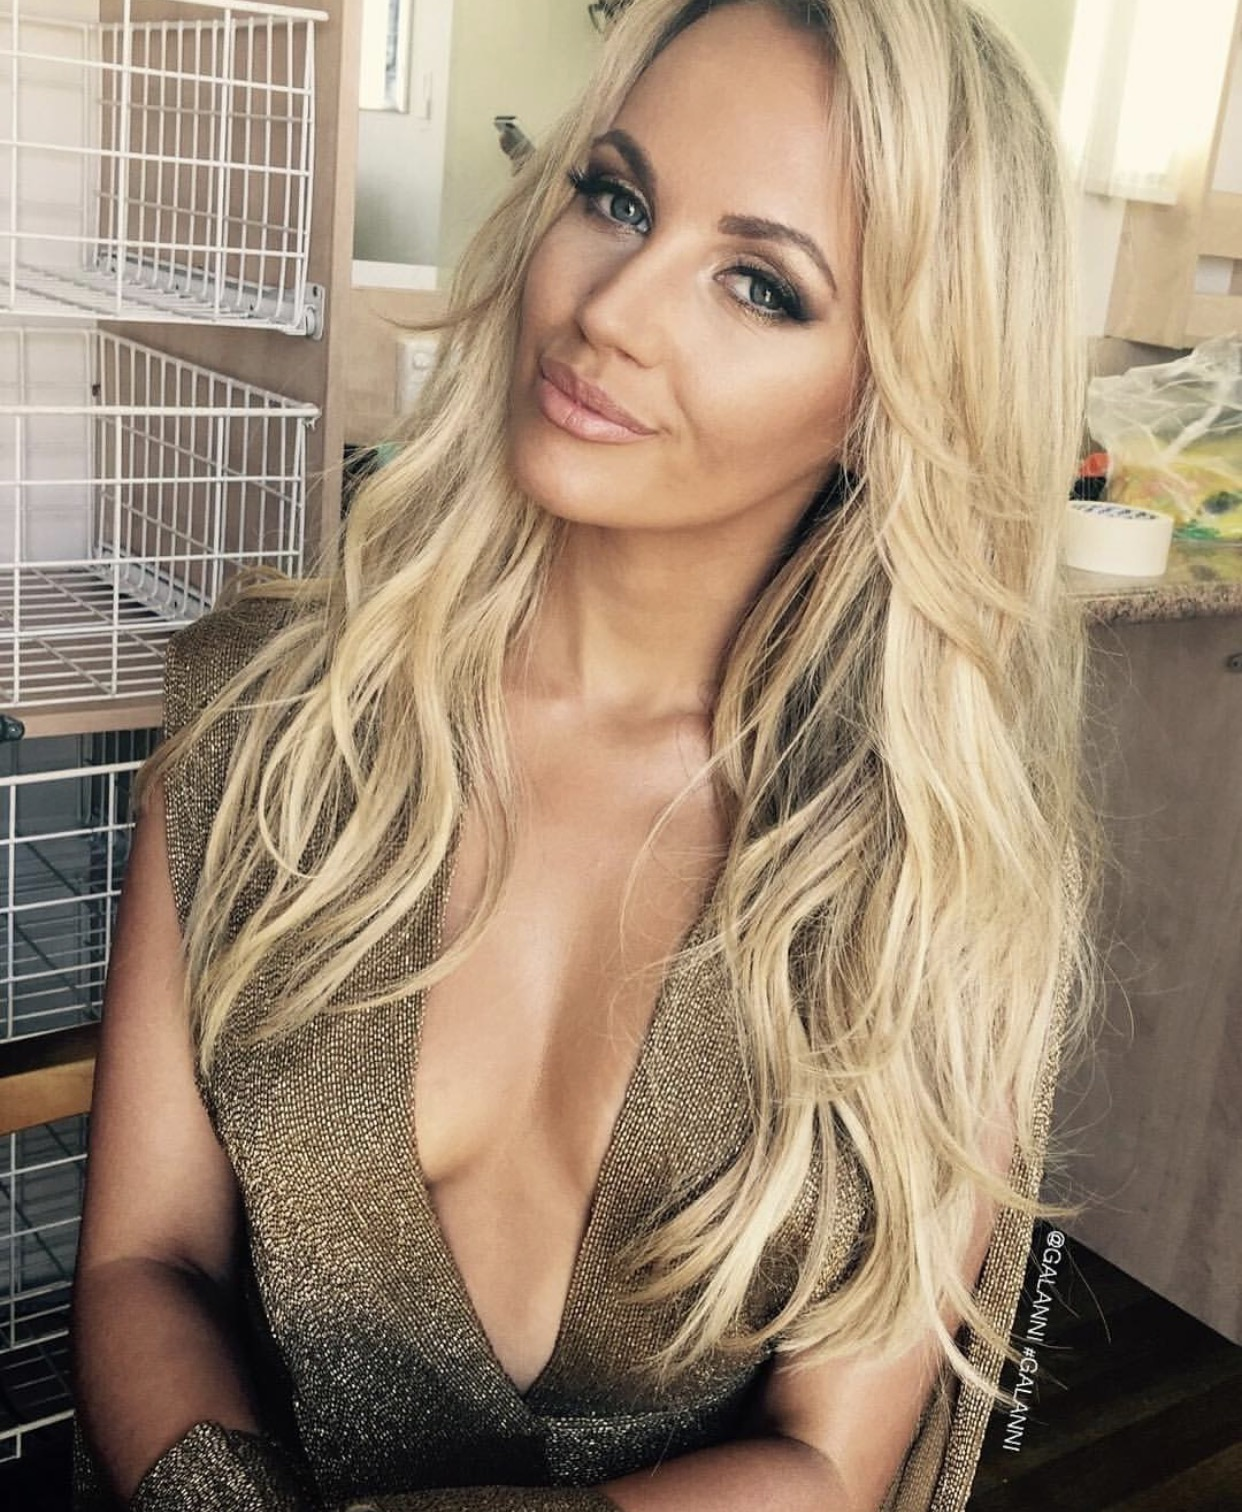 Samantha Jade nudes (63 fotos) Erotica, Twitter, lingerie